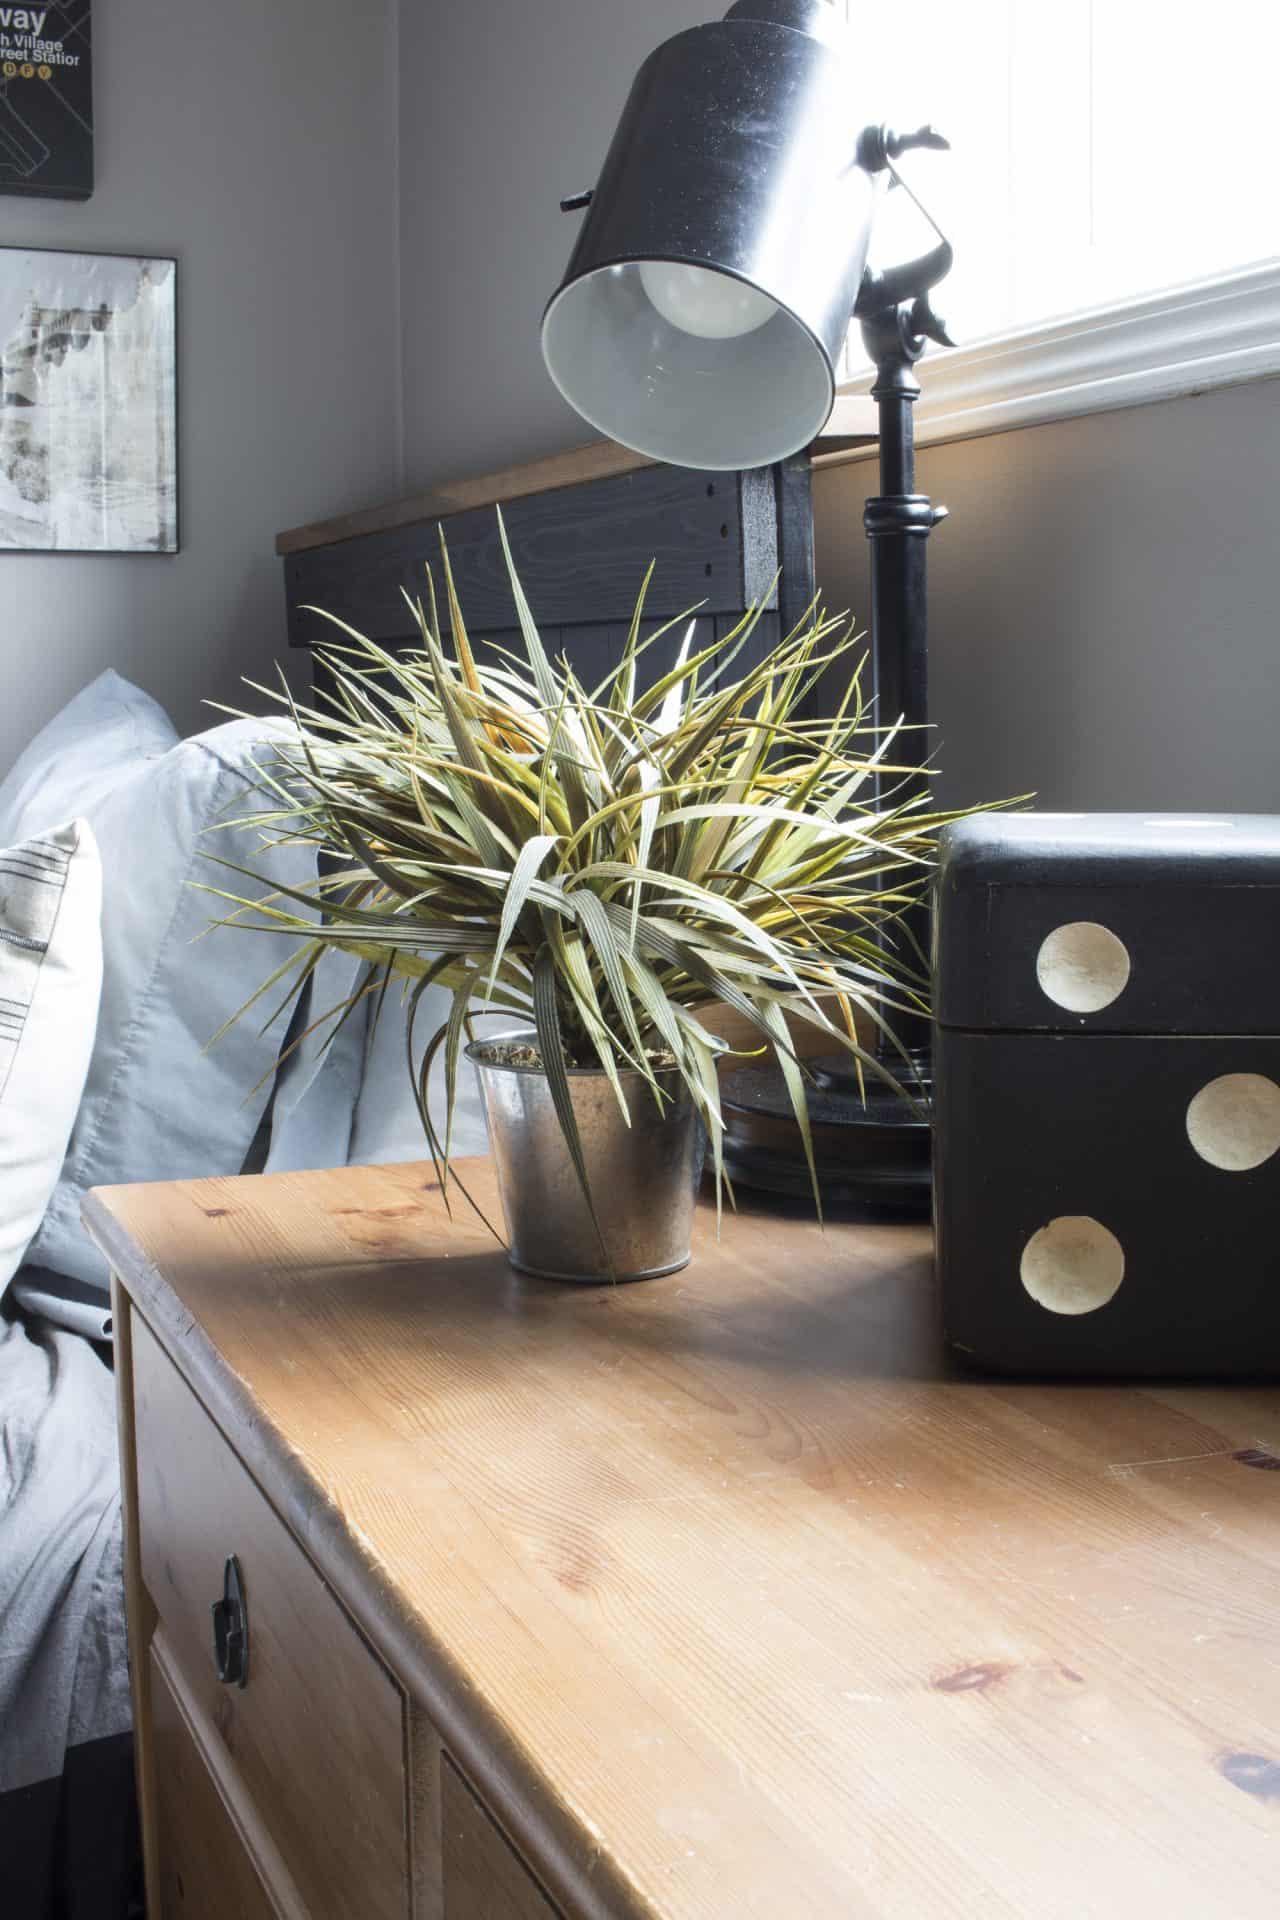 Rustic Industrial Bedroom: A Rustic Industrial Bedroom For A Teenage Boy